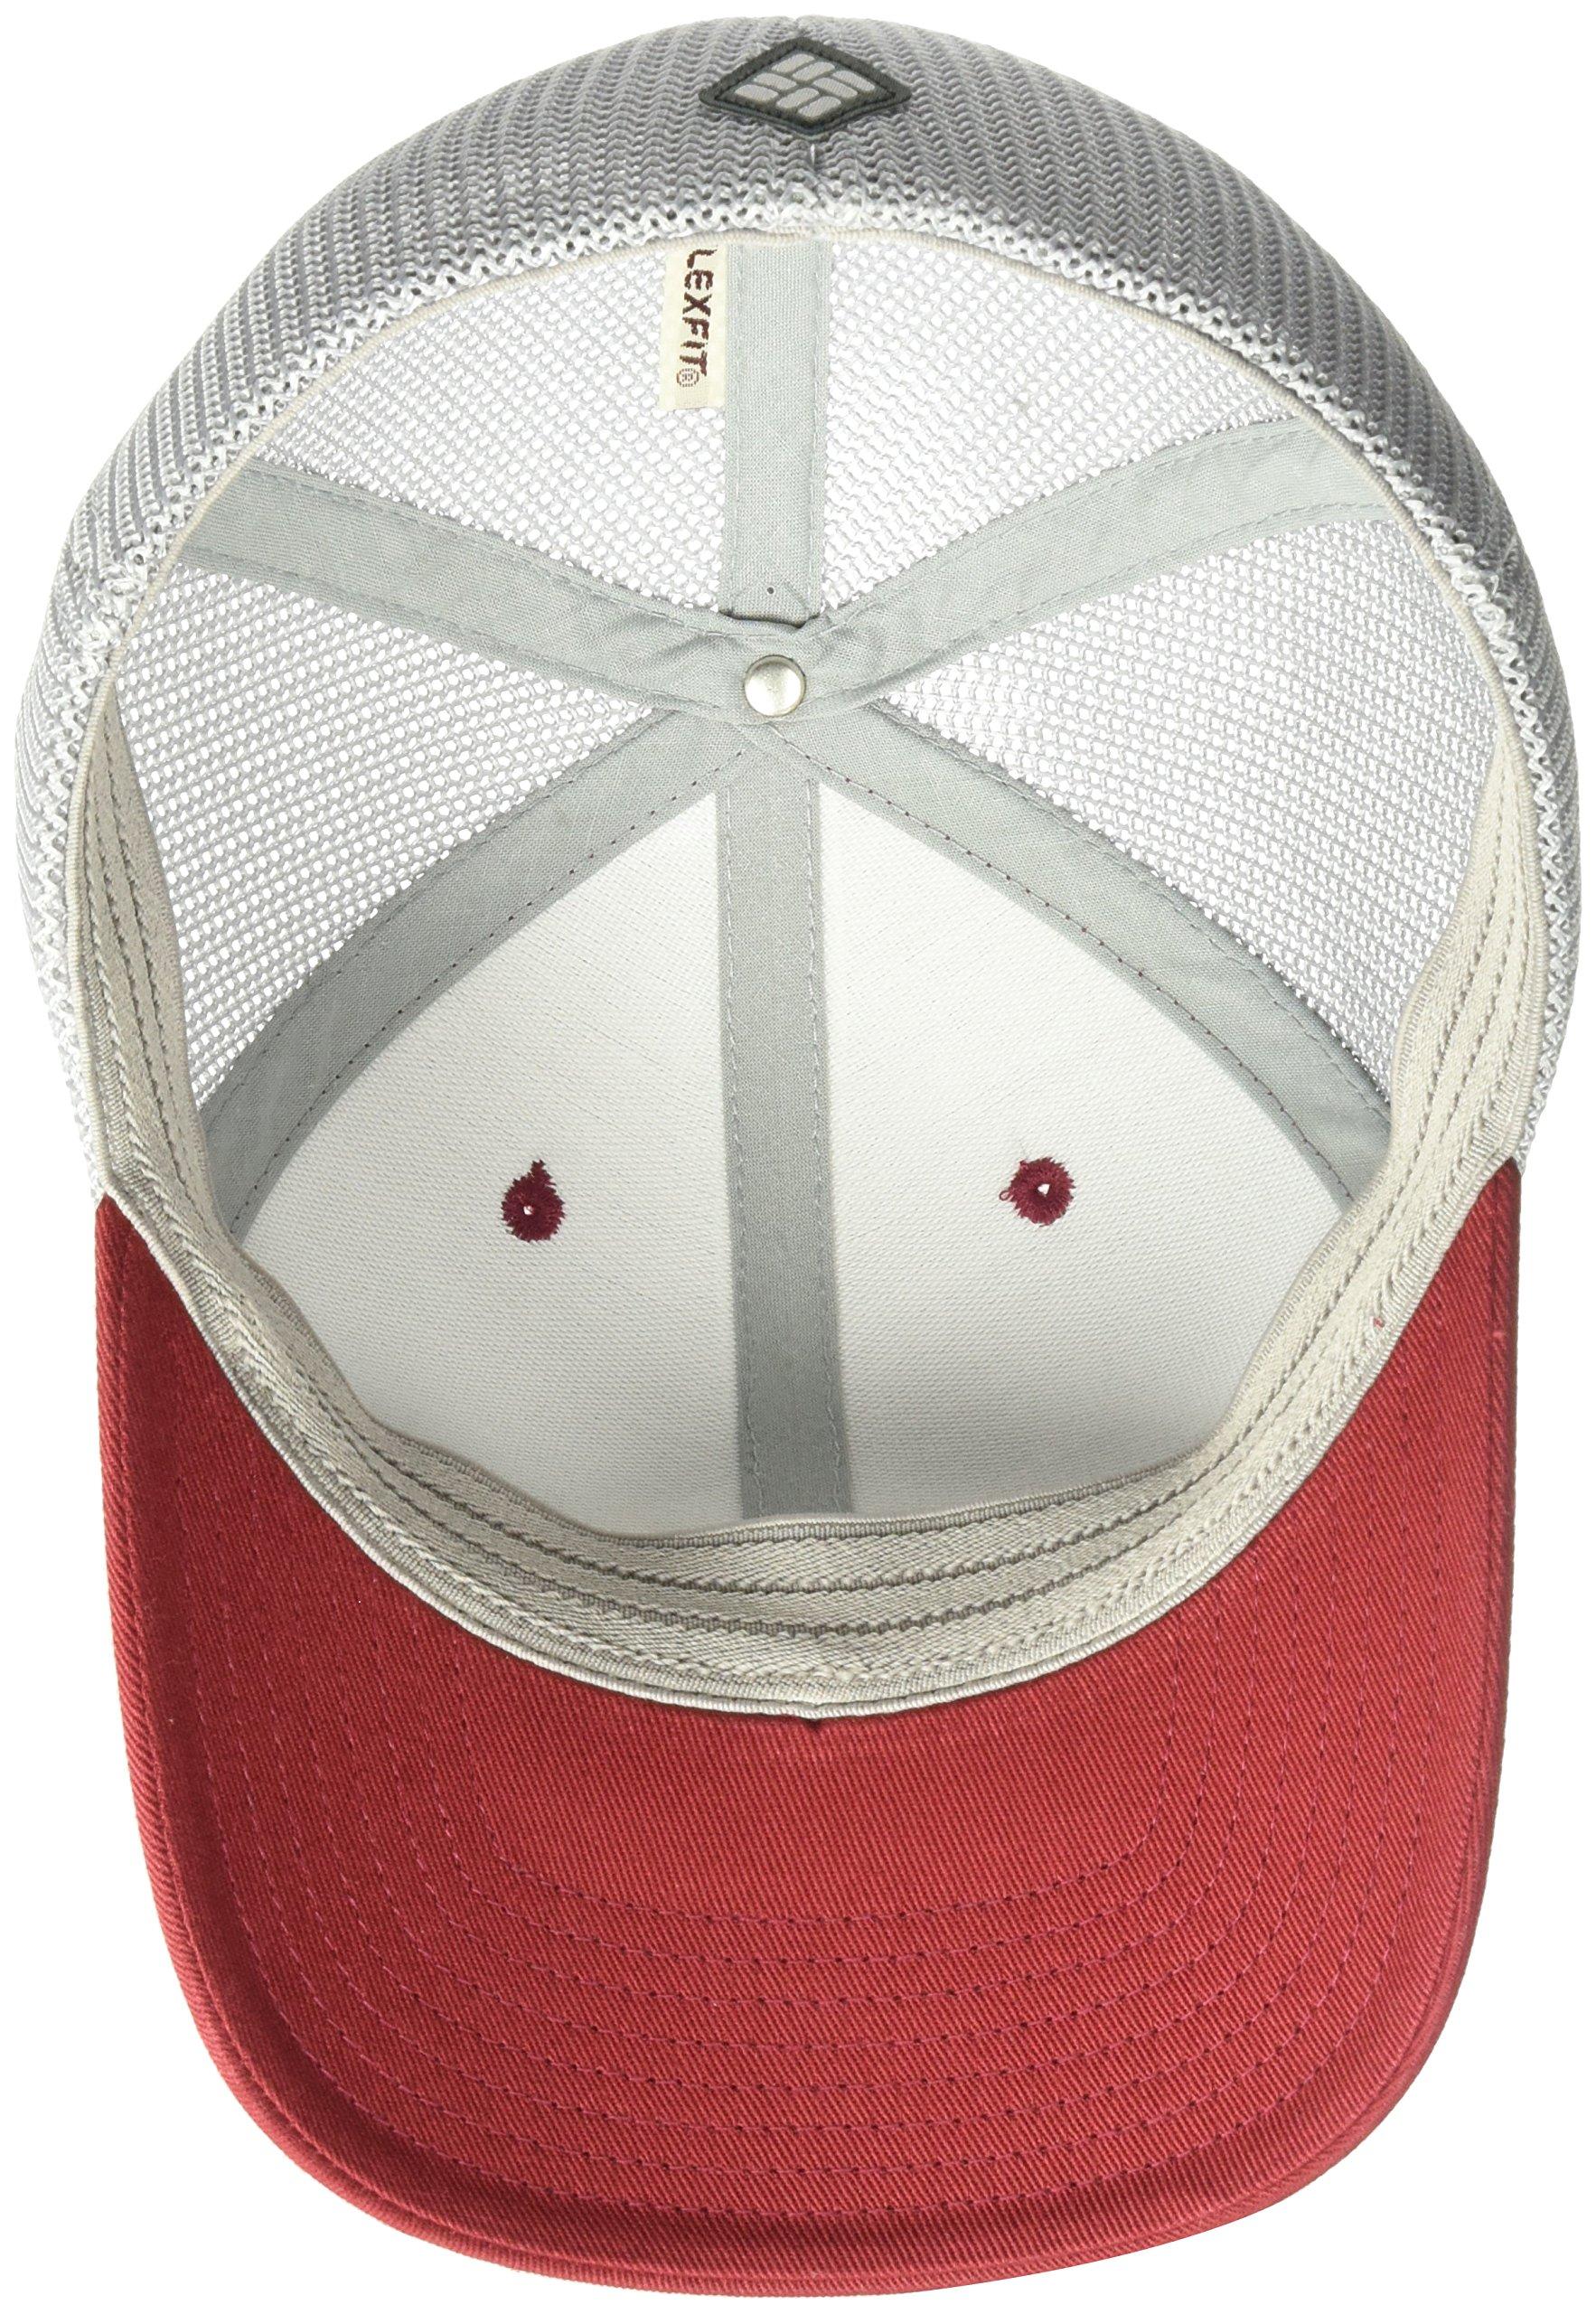 1b6e48cf183 Columbia Men s Rugged Outdoor Mesh Hat   Baseball Caps   Clothing ...